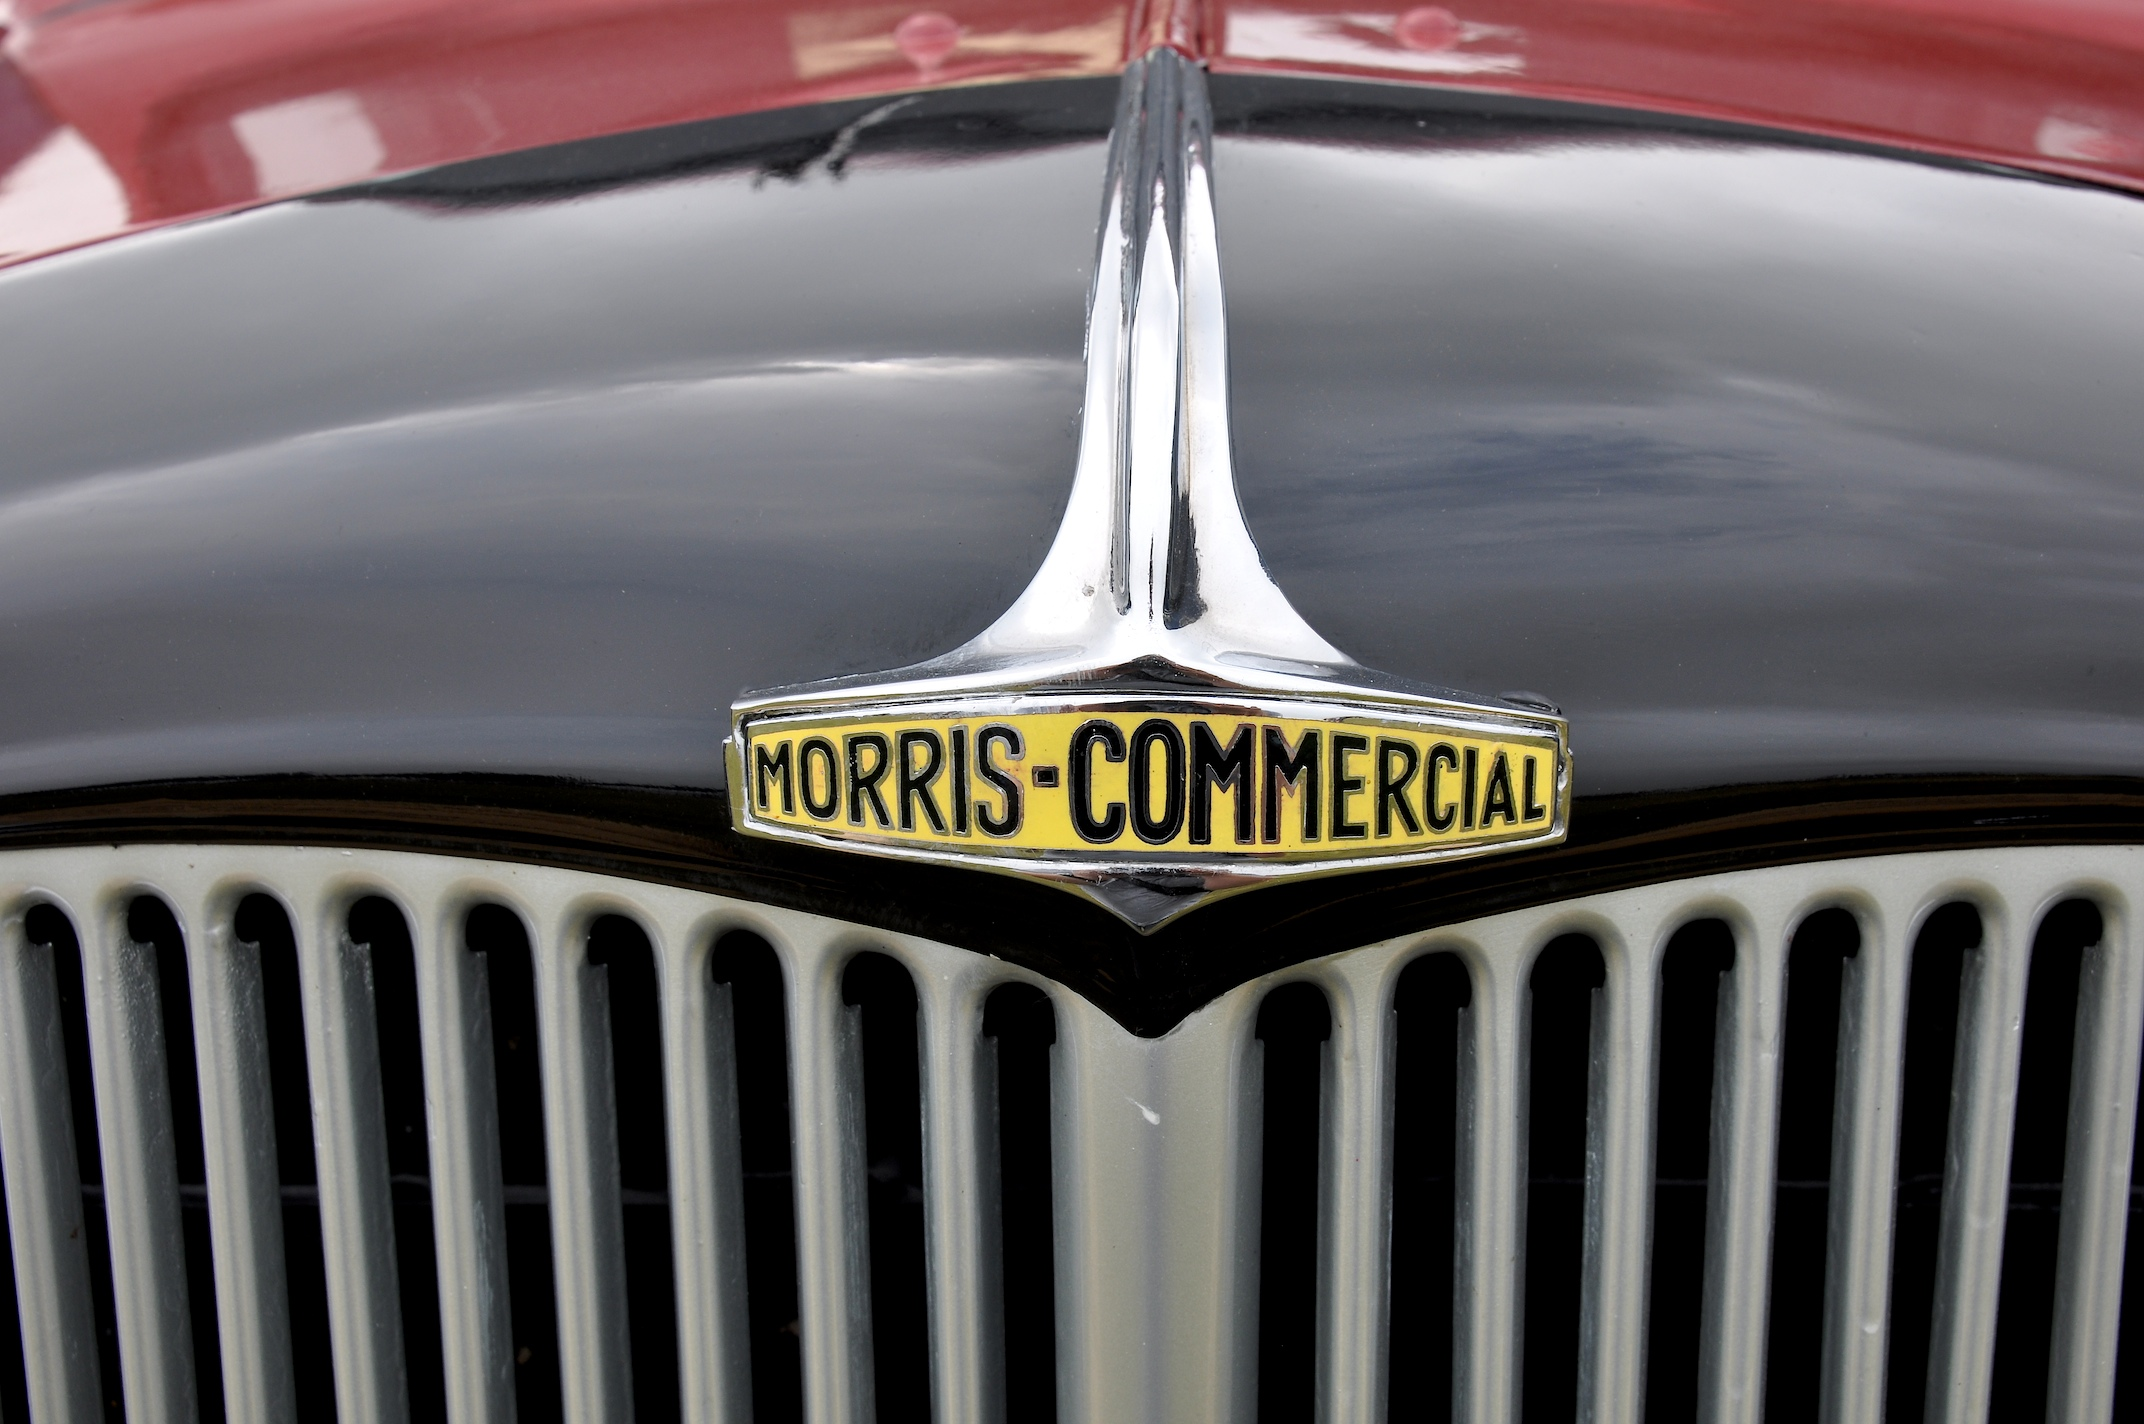 Morris Commercial Cars